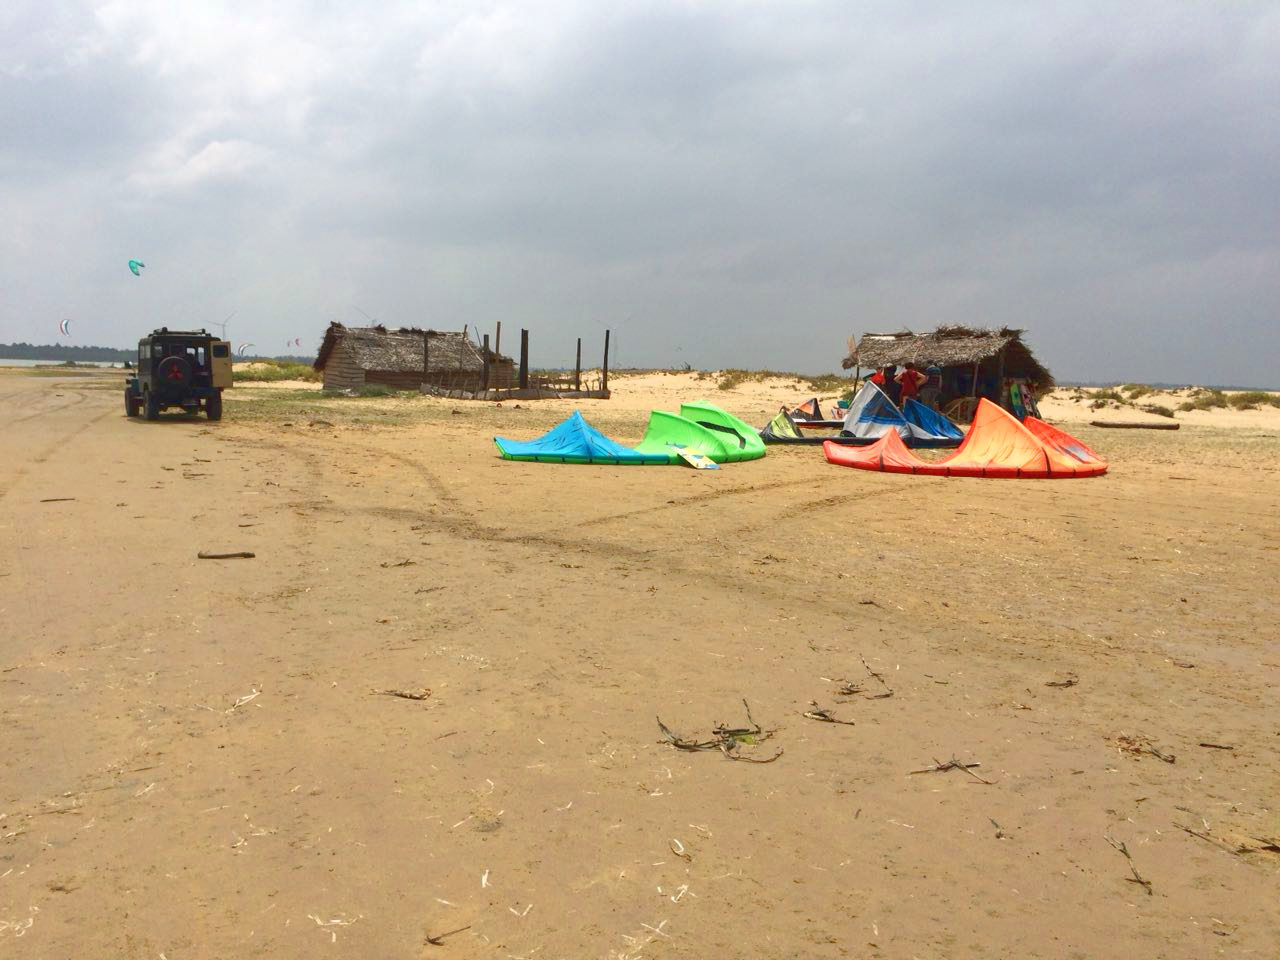 discover-kalpitiya-by-jeep-kitesurfing (1).jpg